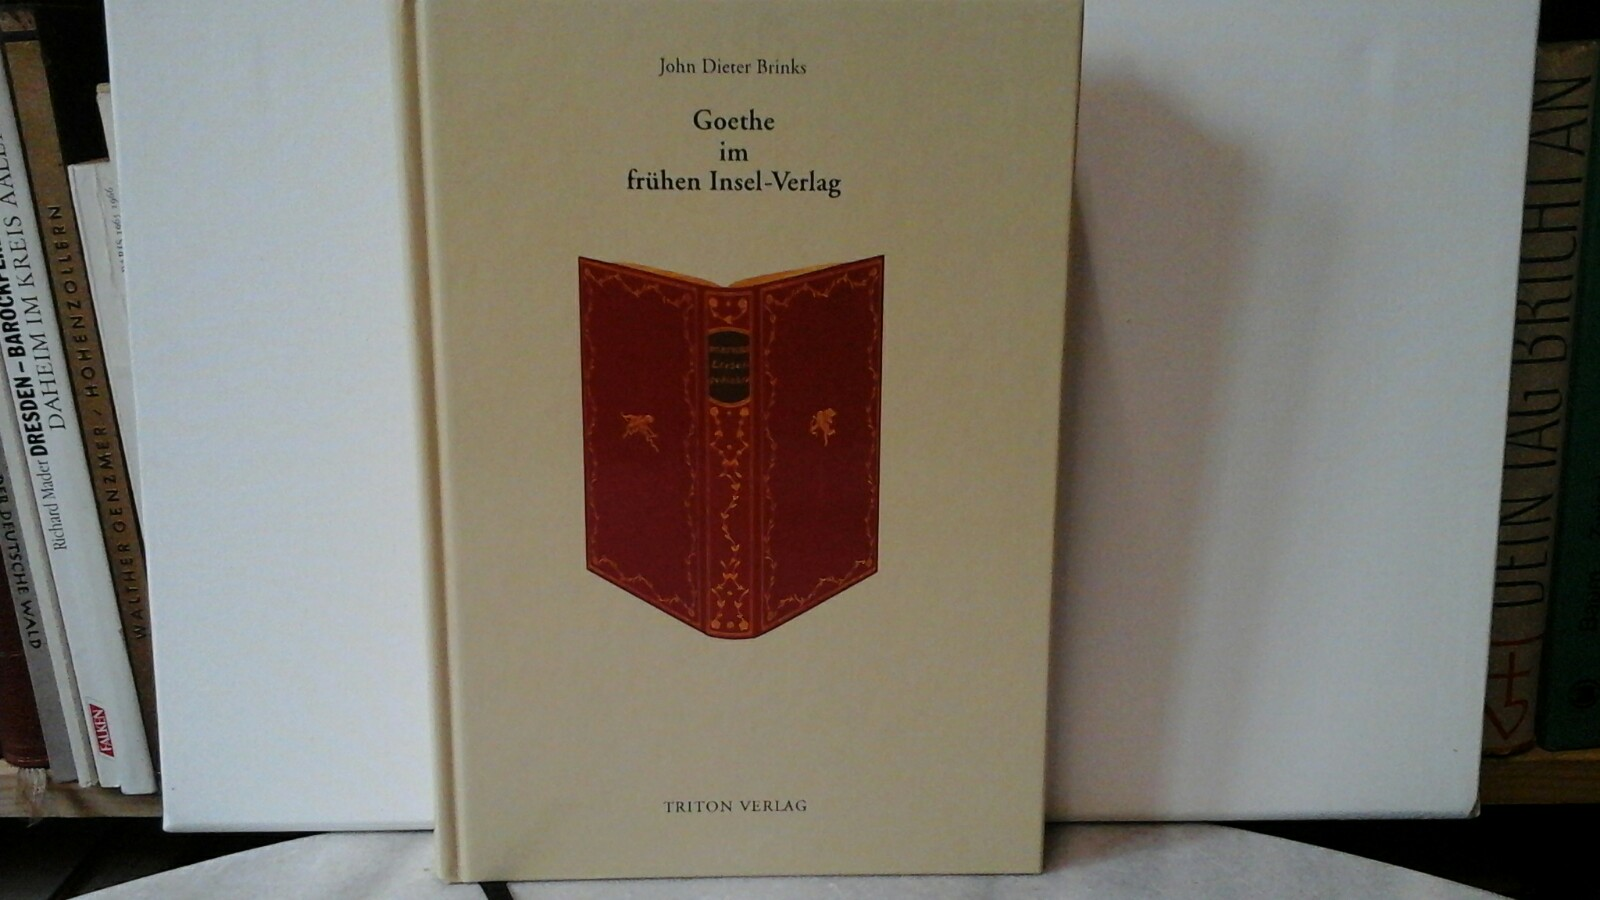 Goethe im frühen Insel-Verlag. Erste /1./ Ausgabe.